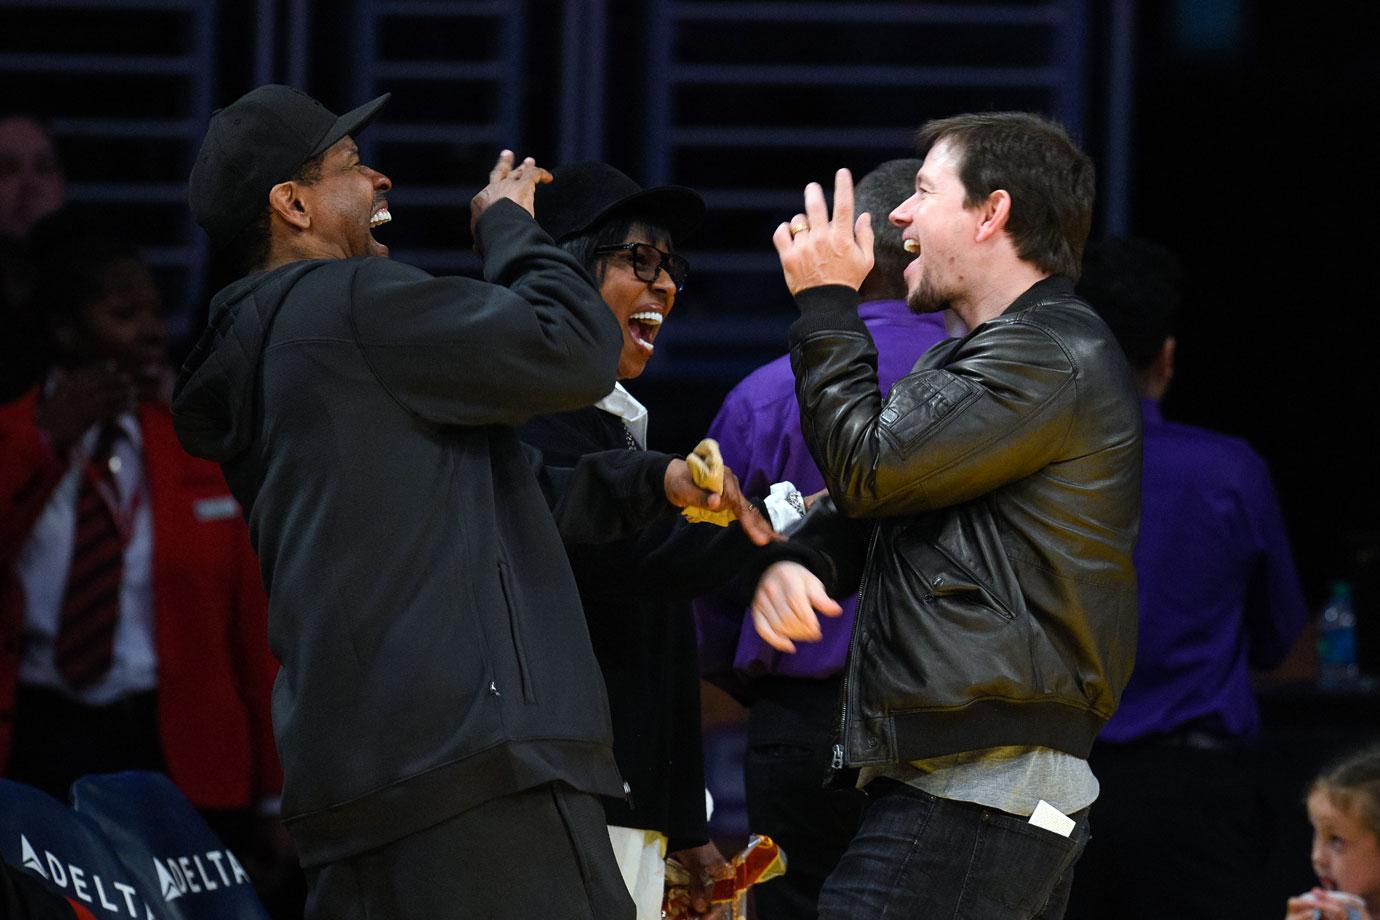 Feb. 27, 2015: Los Angeles Lakers vs. Milwaukee Bucks at Staples Center in Los Angeles